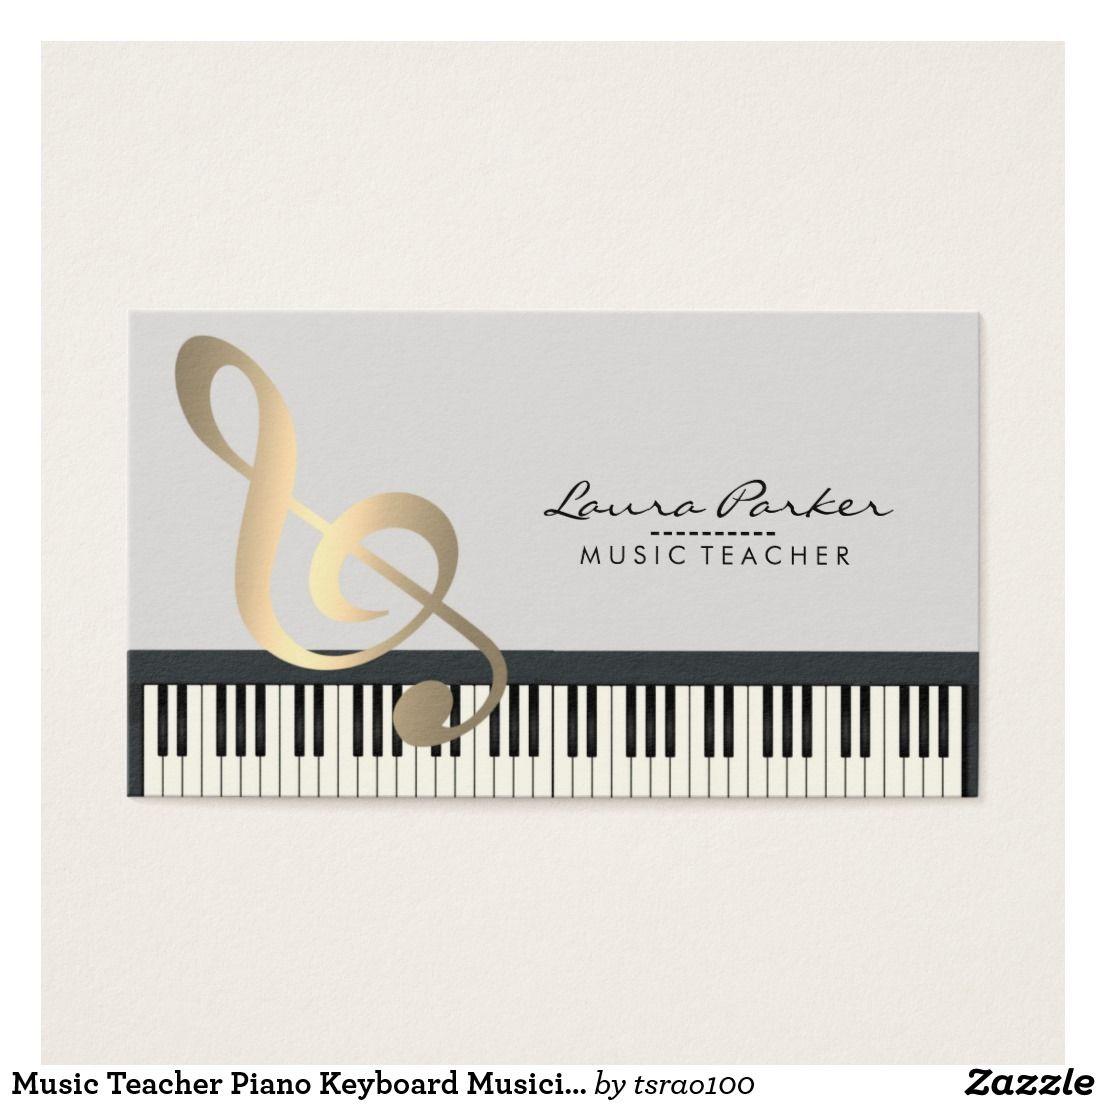 Music Teacher Piano Keyboard Musician Pianist Business Card Music